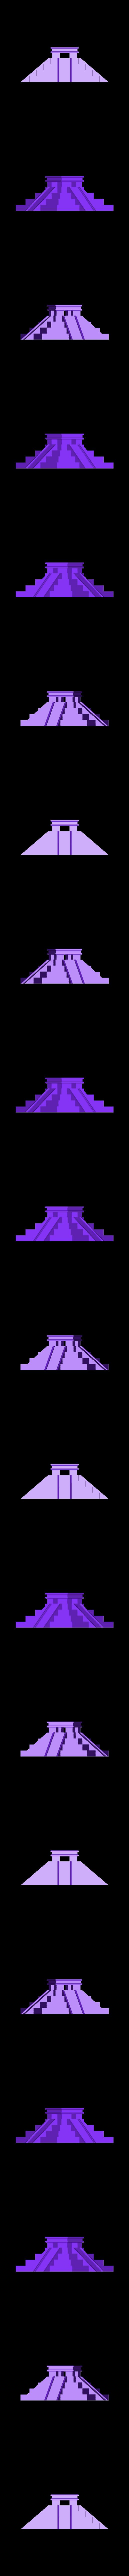 aztec_pot.stl Download free STL file Aztec temple plant pot • 3D printable design, poblocki1982